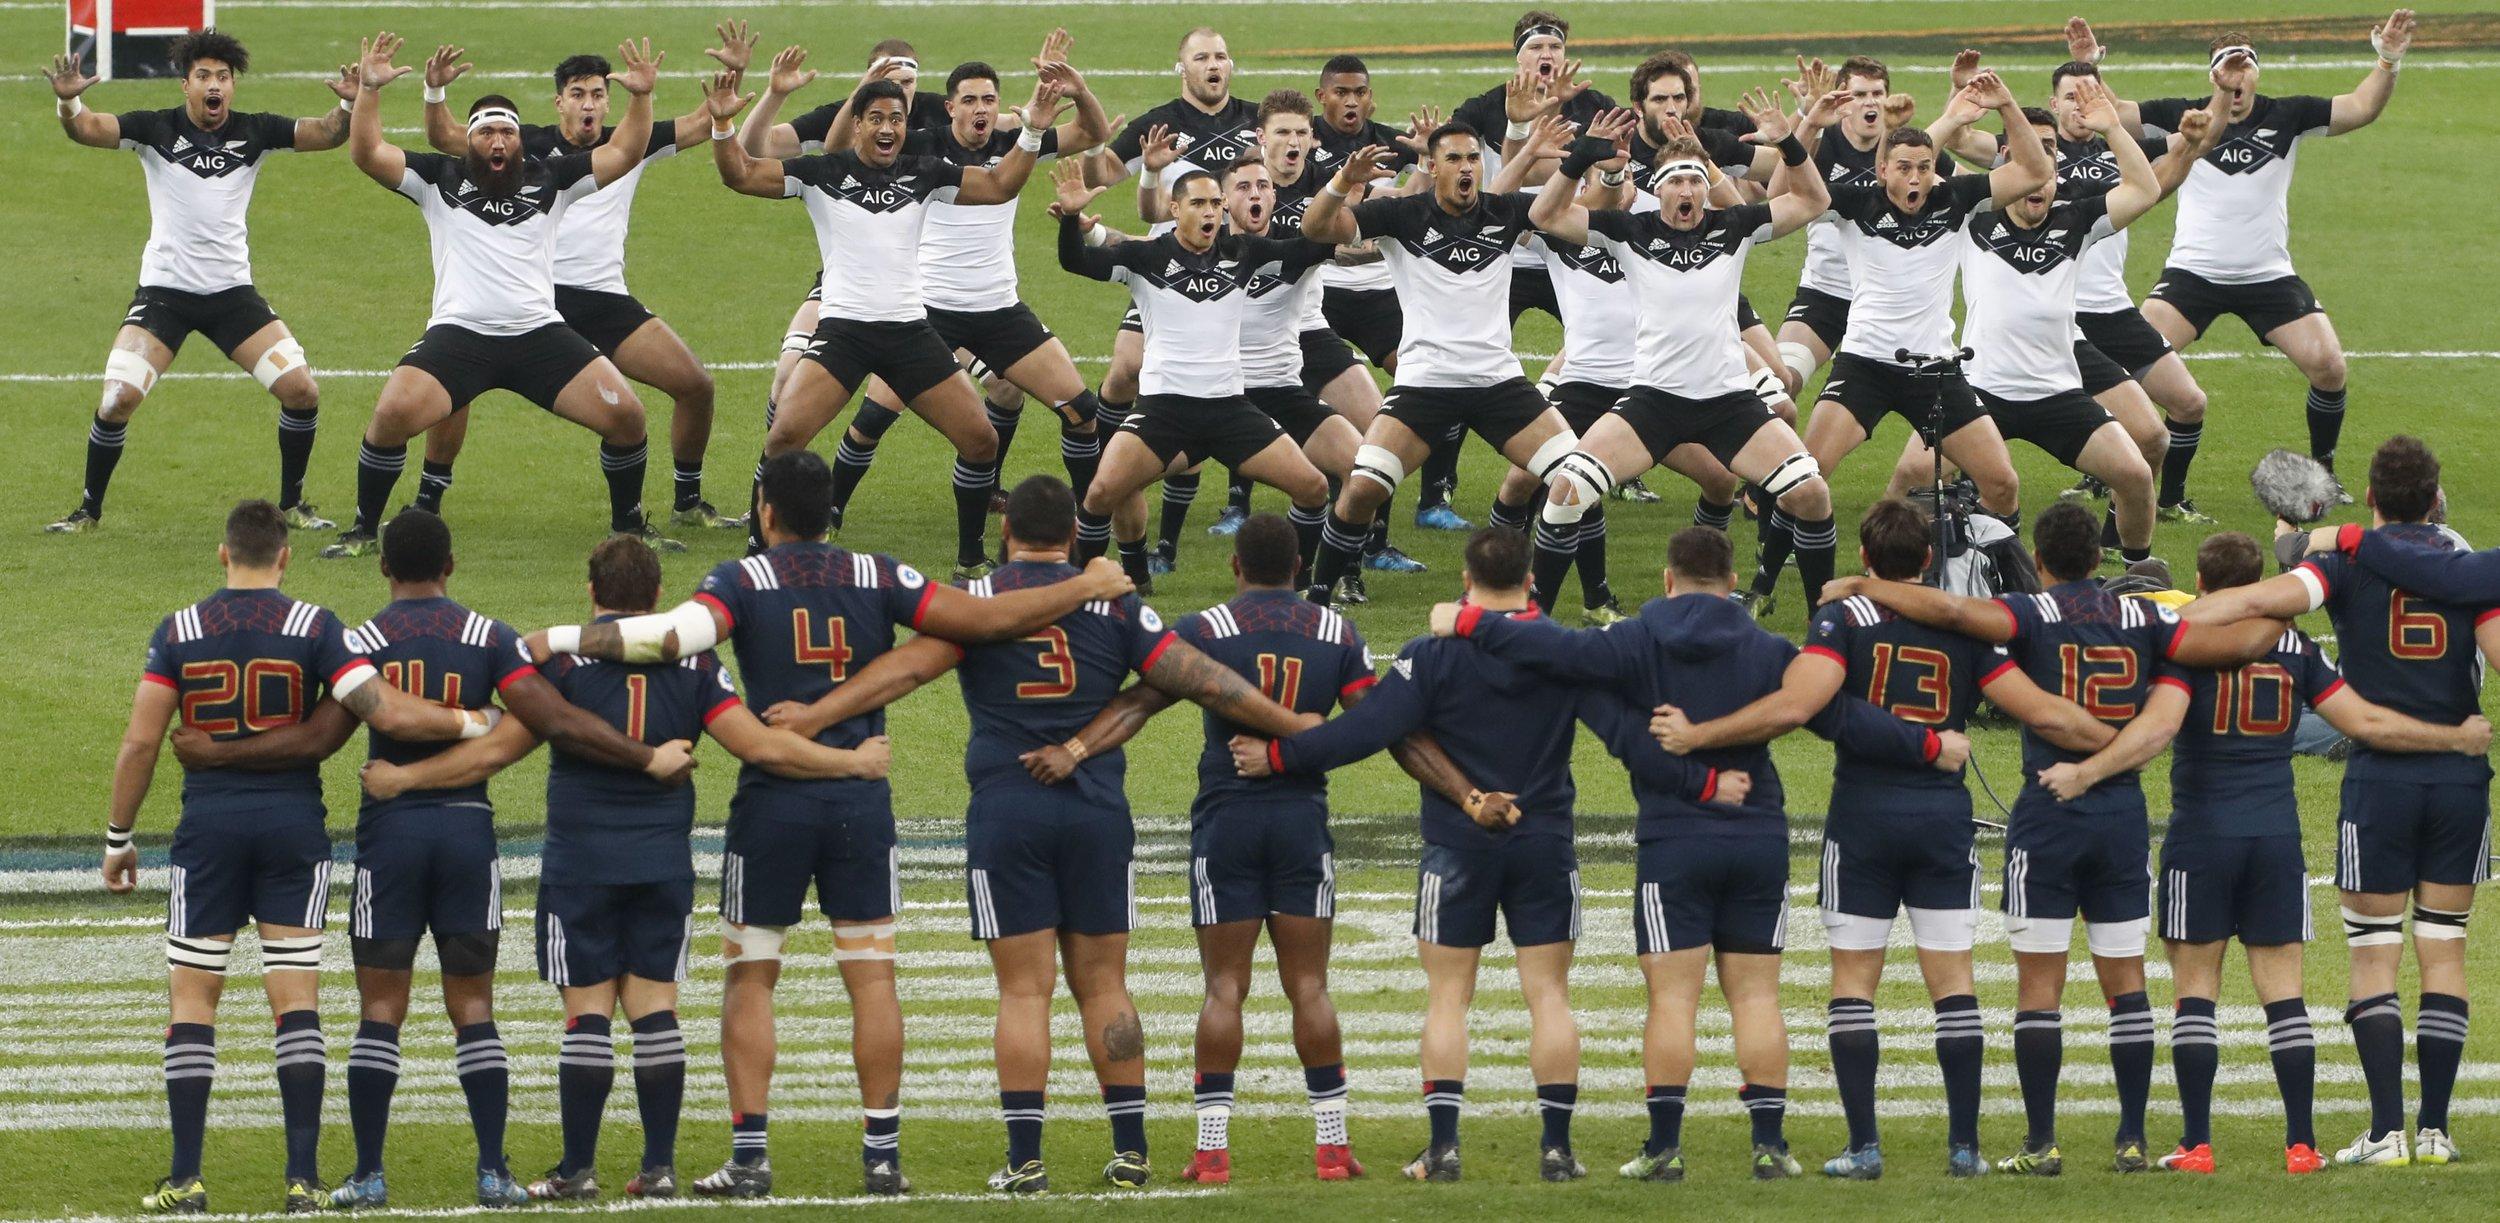 France-Nouvelle-Zelande-la-reponse-des-Bleus-face-au-haka-des-All-Blacks.jpg